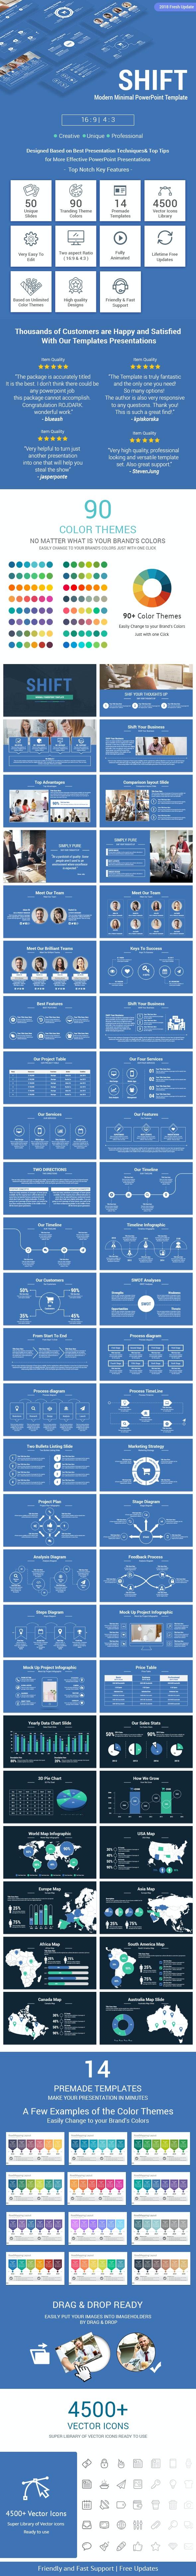 Shift PowerPoint Presentation Template - Business PowerPoint Templates